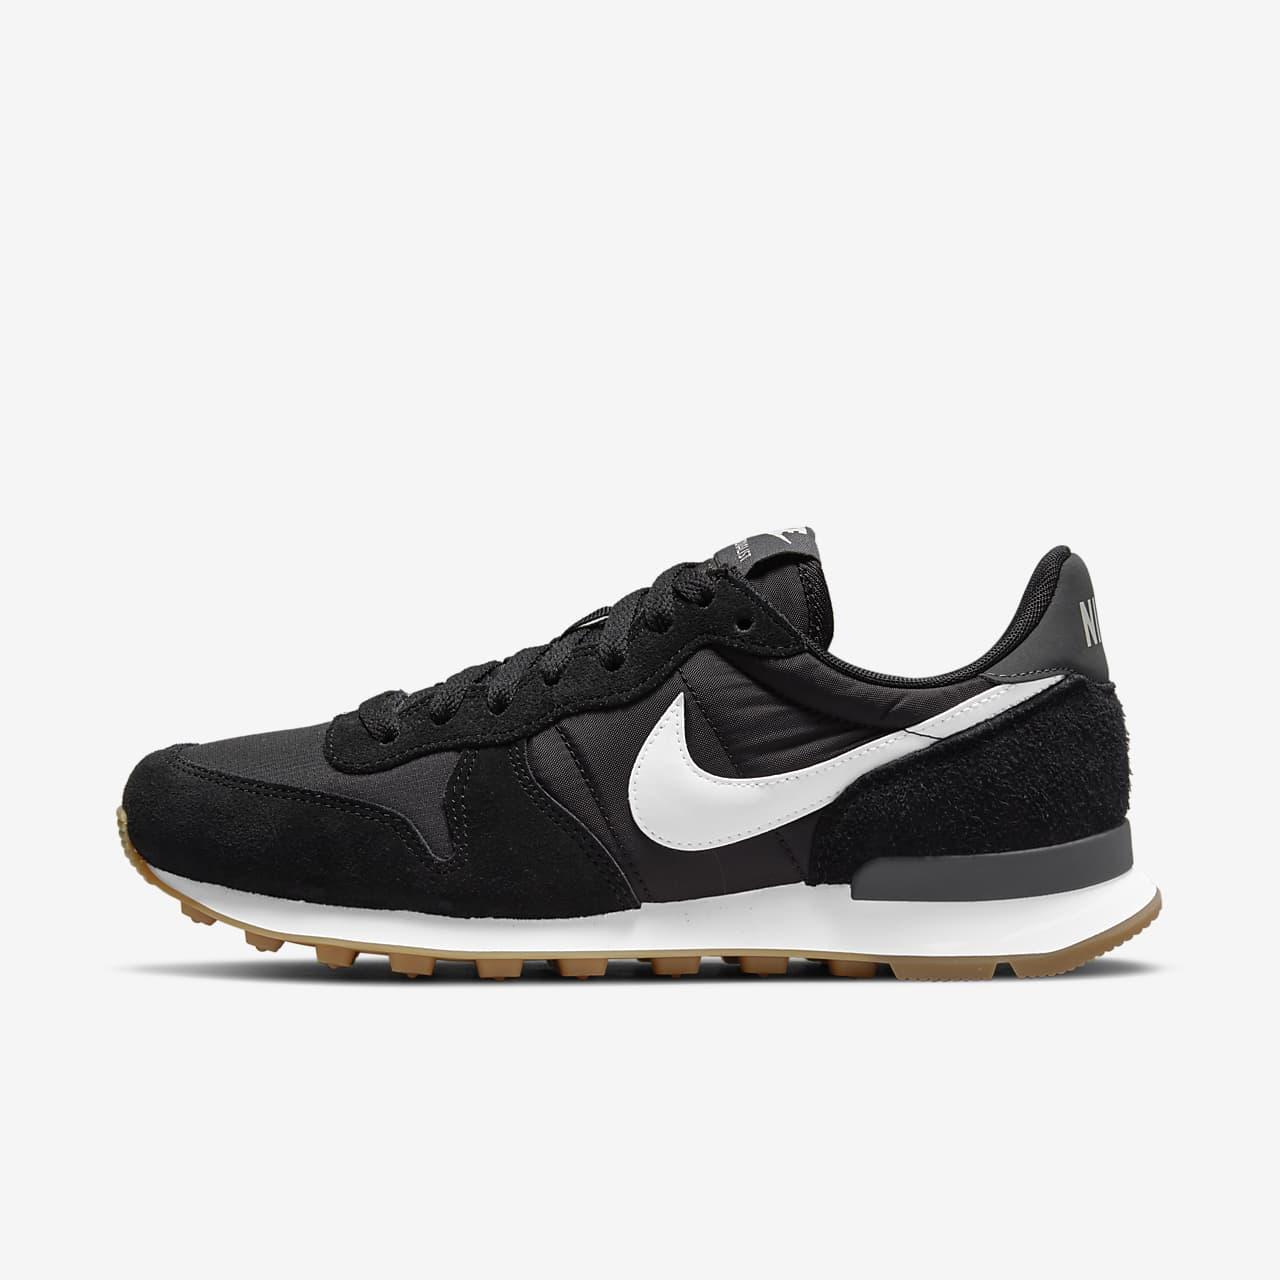 Dámská bota Nike Internationalist